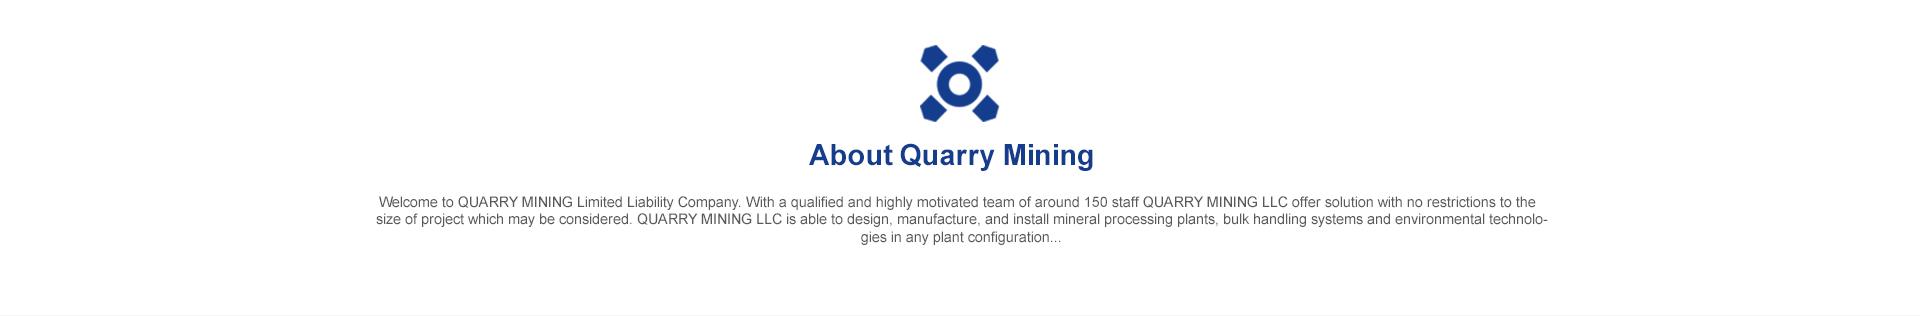 quarry-mining-landing1.jpg